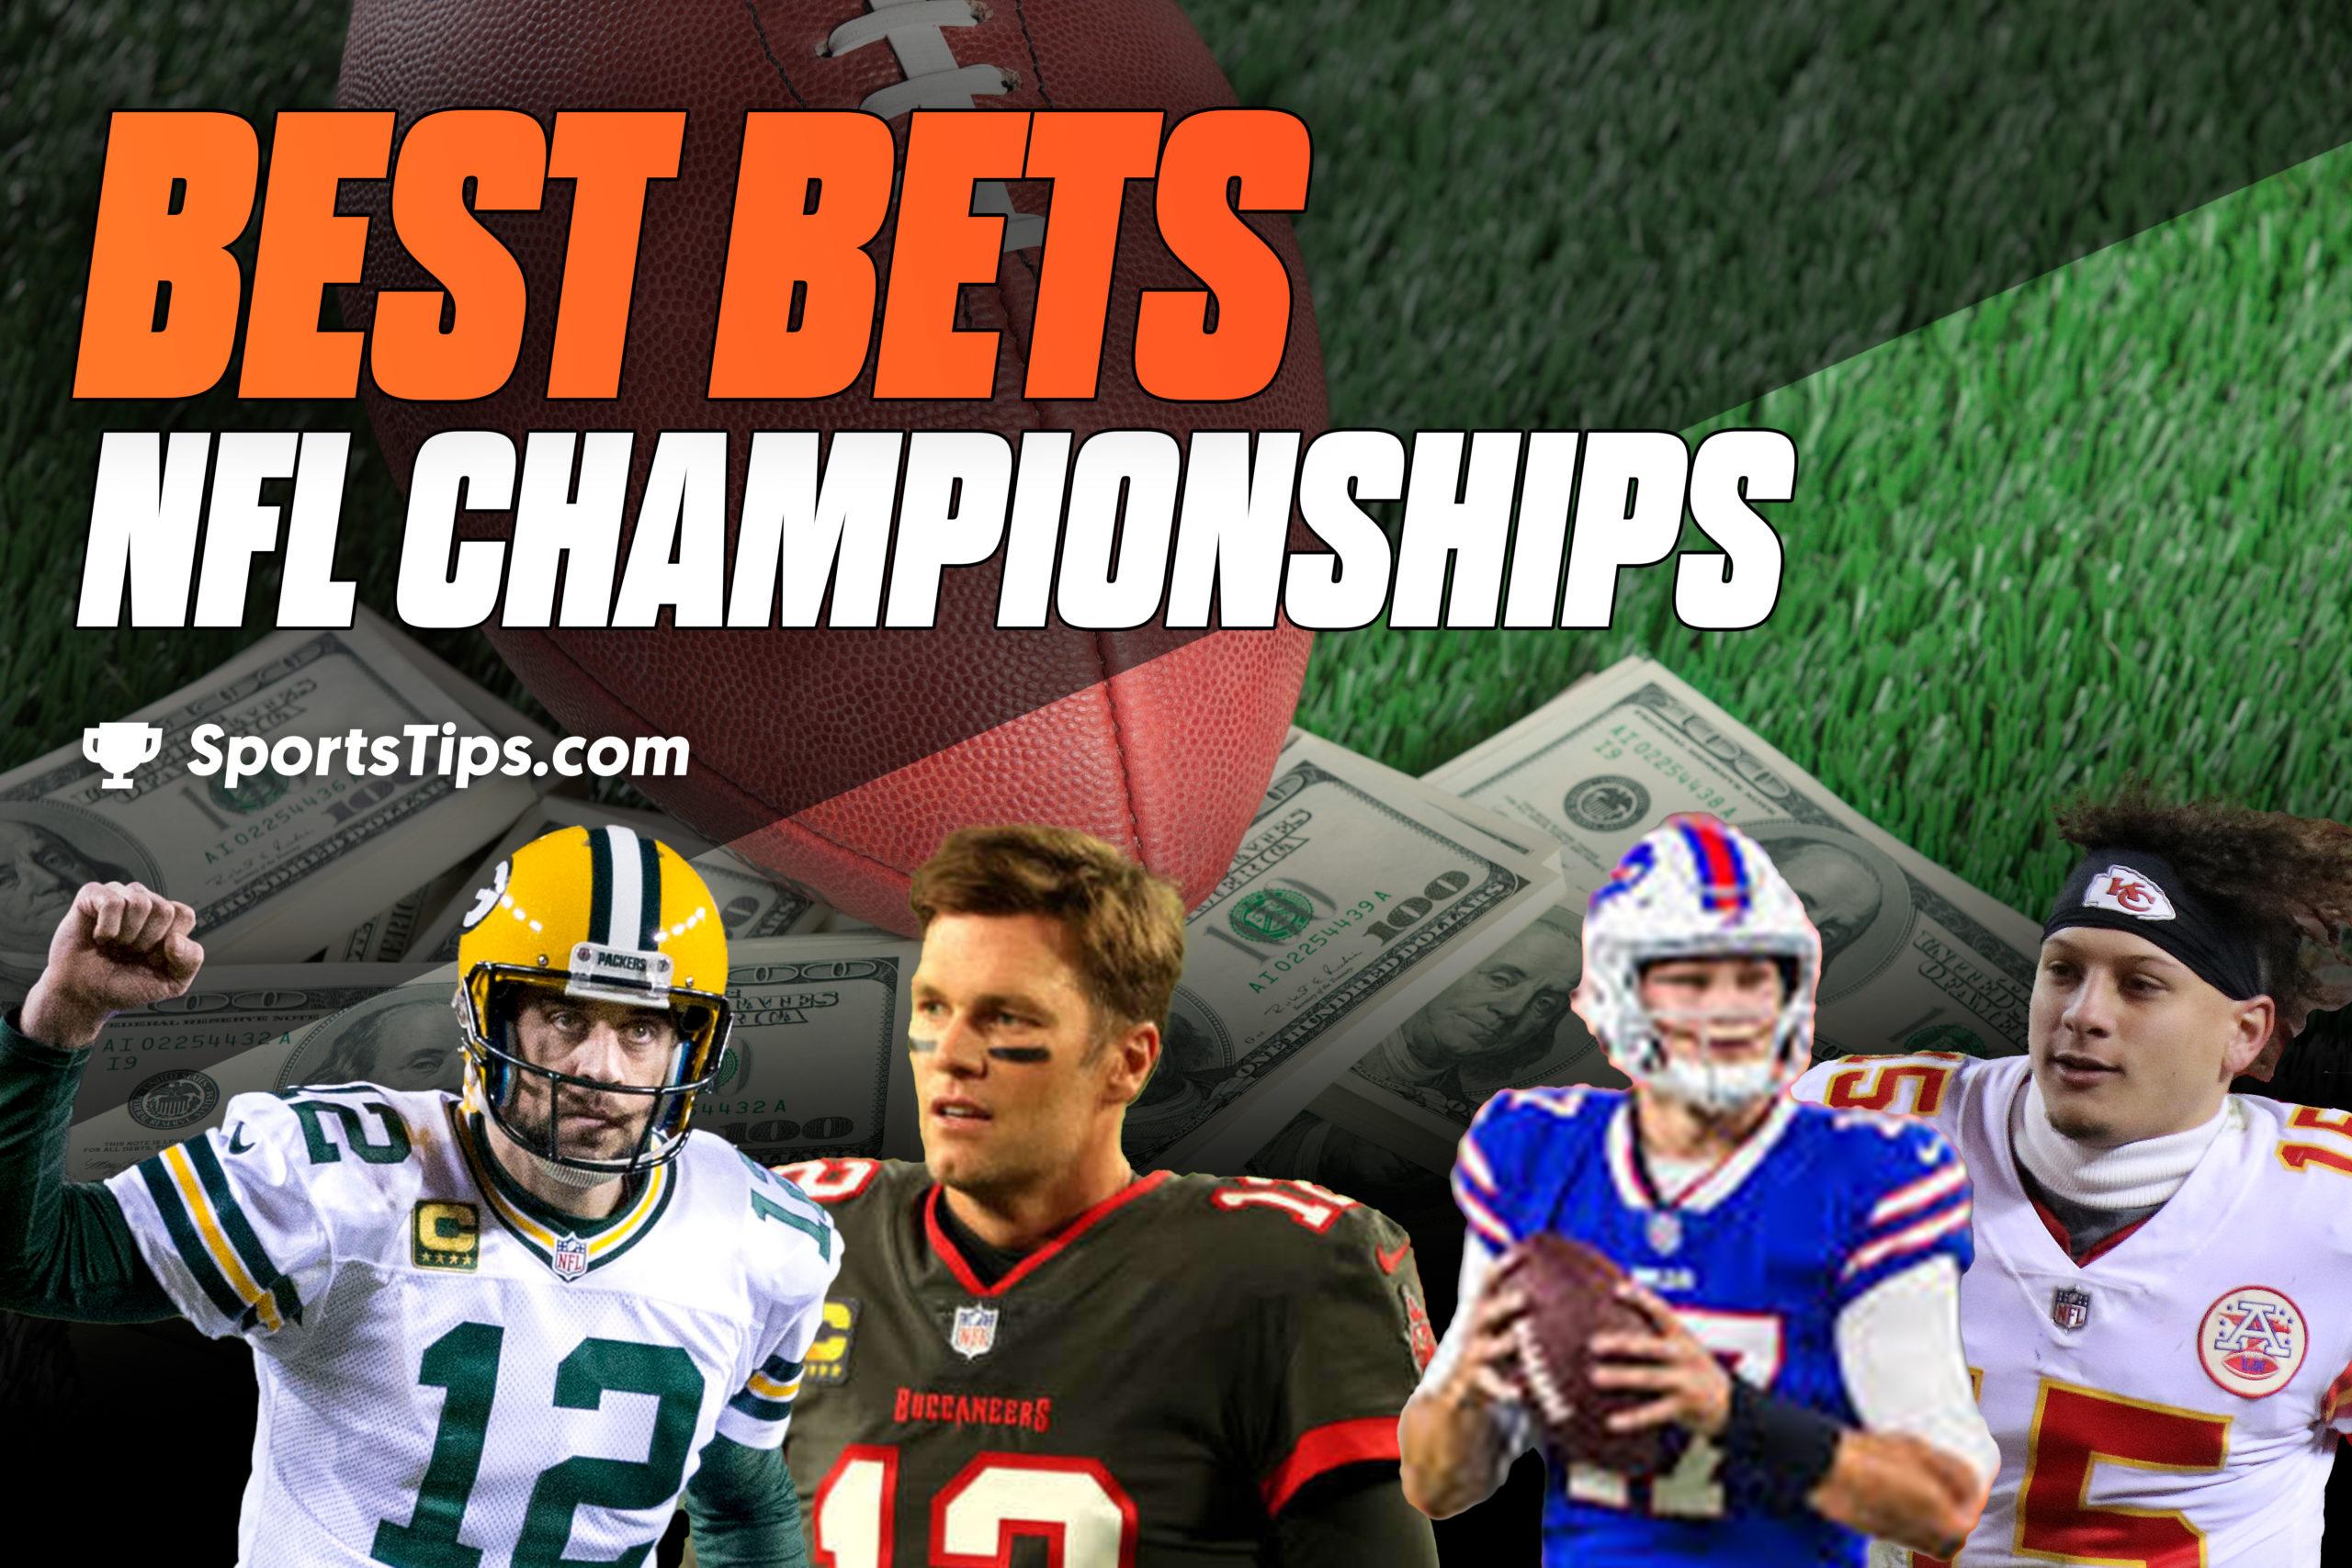 SportsTips' NFL Best Bets For Conference Championships